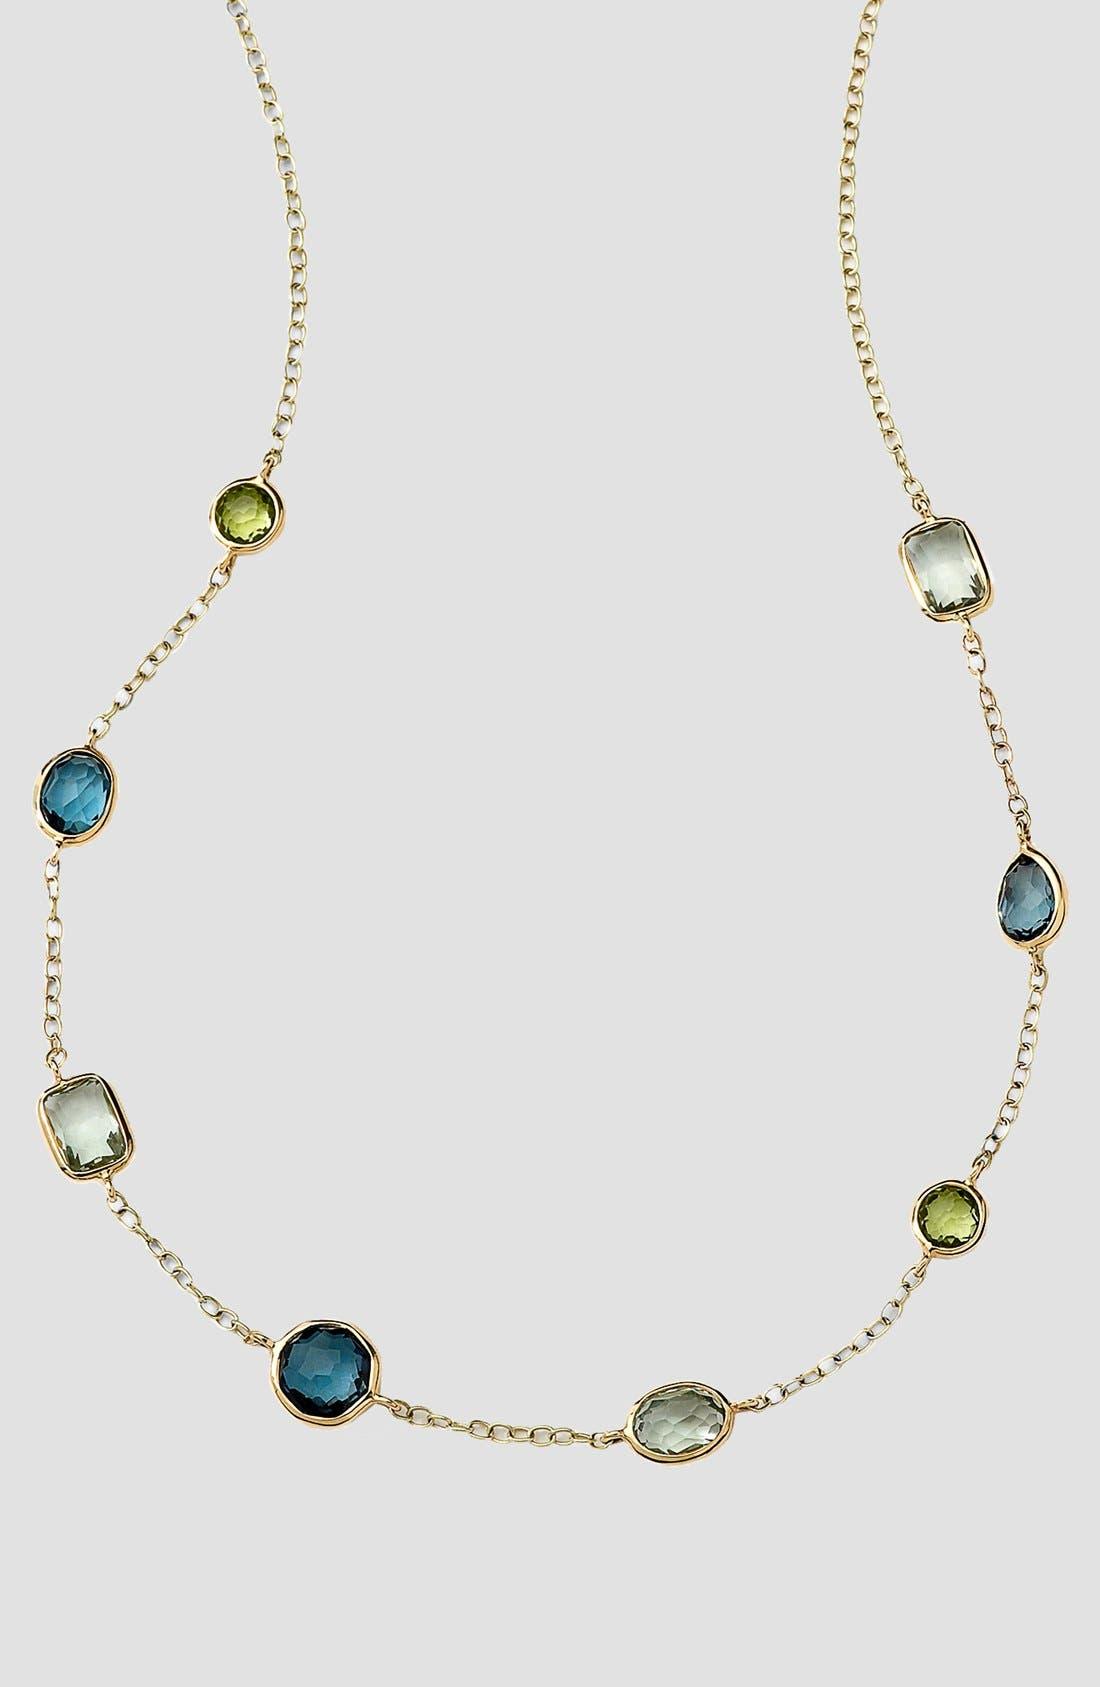 Alternate Image 1 Selected - Ippolita 'Rock Candy - Mini Gelato' 18k Gold Station Necklace